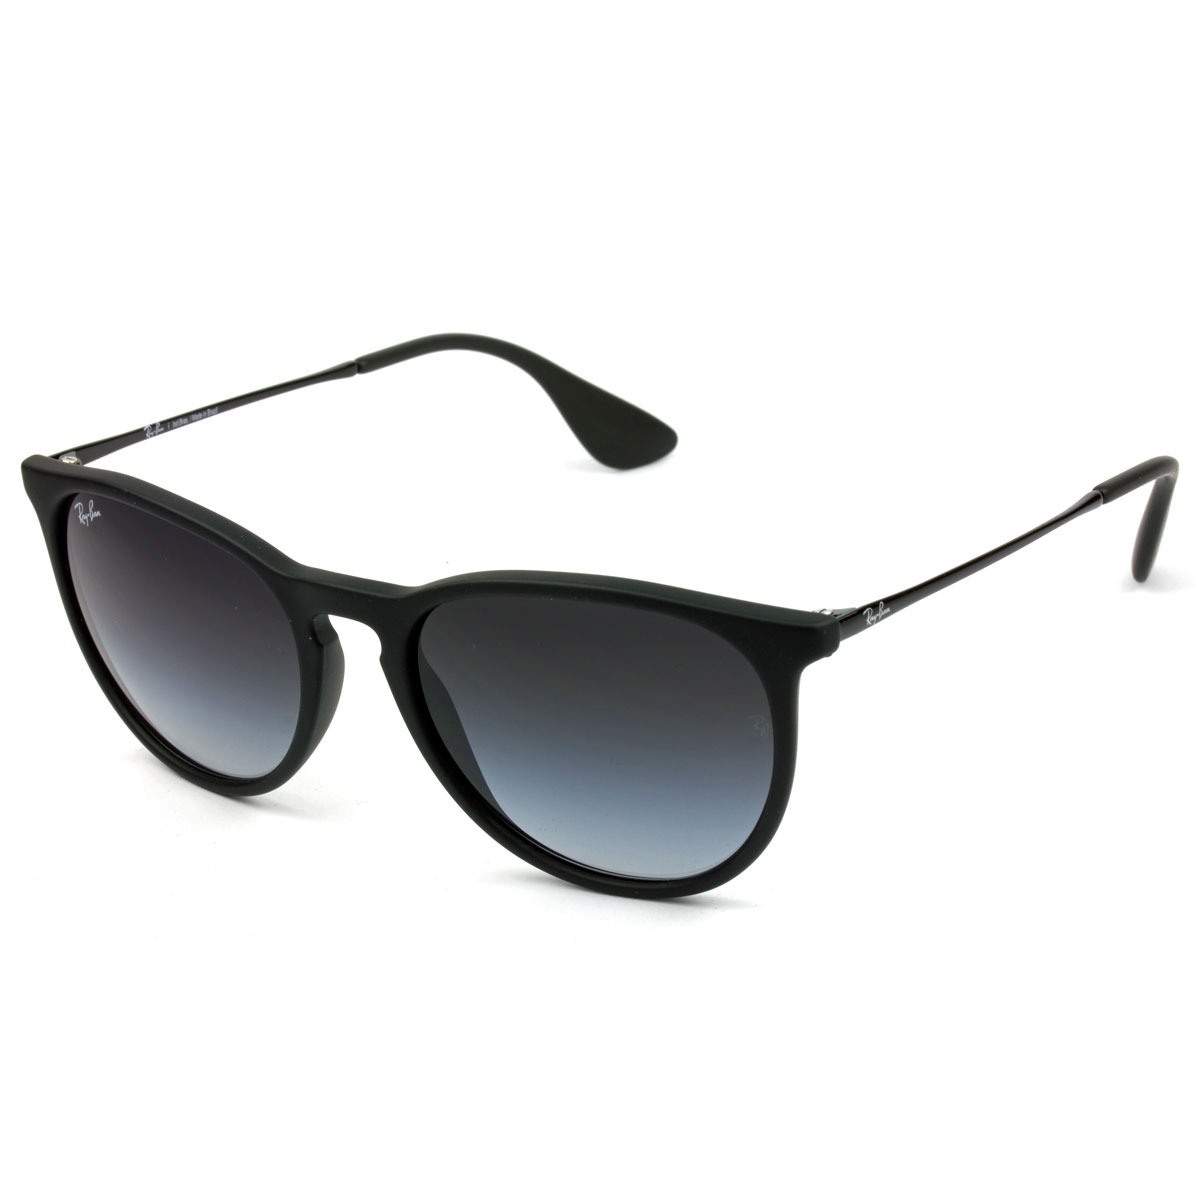 c208dc9a0 oculos sol erika feminino masculino preto polarizado. Carregando zoom.